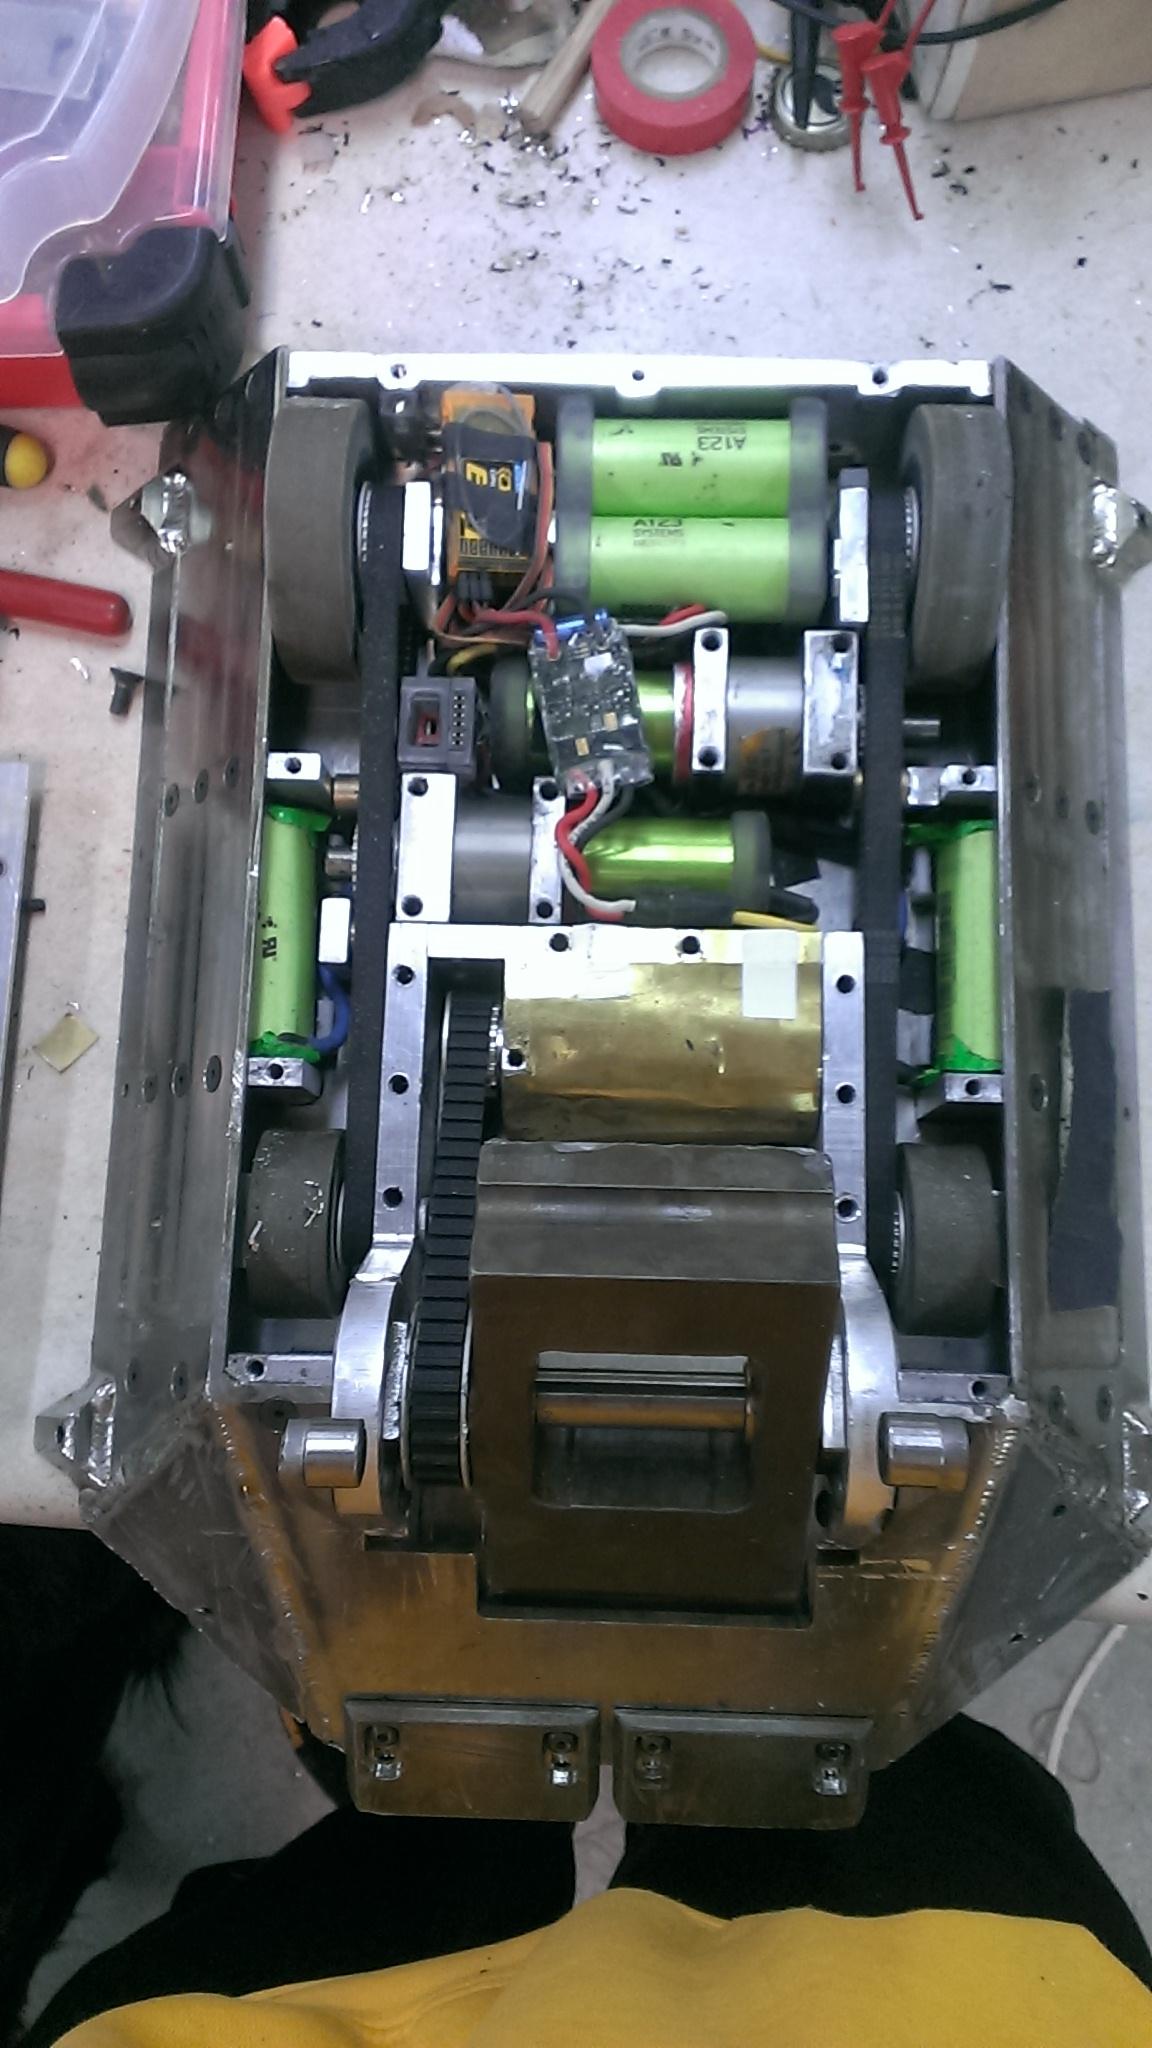 New 15 pound beater bot IMAG3326